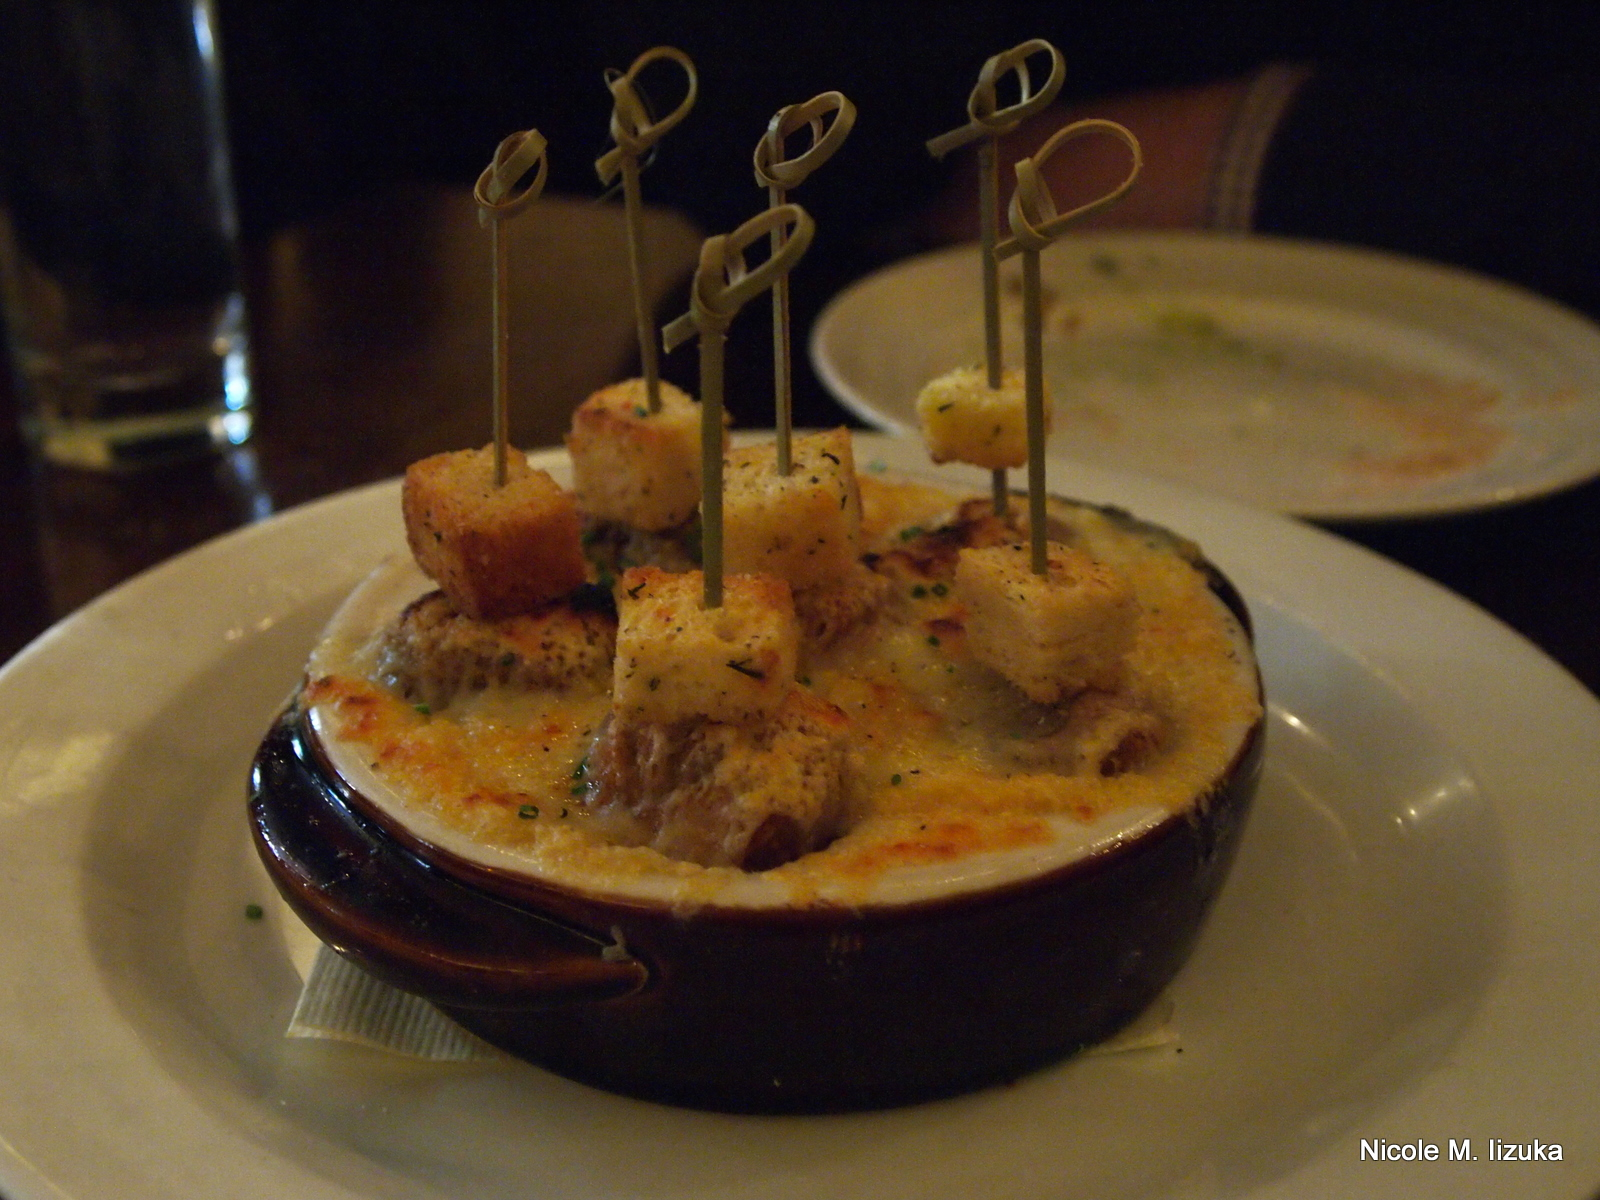 Nicole M Iizuka: French Onion Soup Dumplings: The Stanton Social